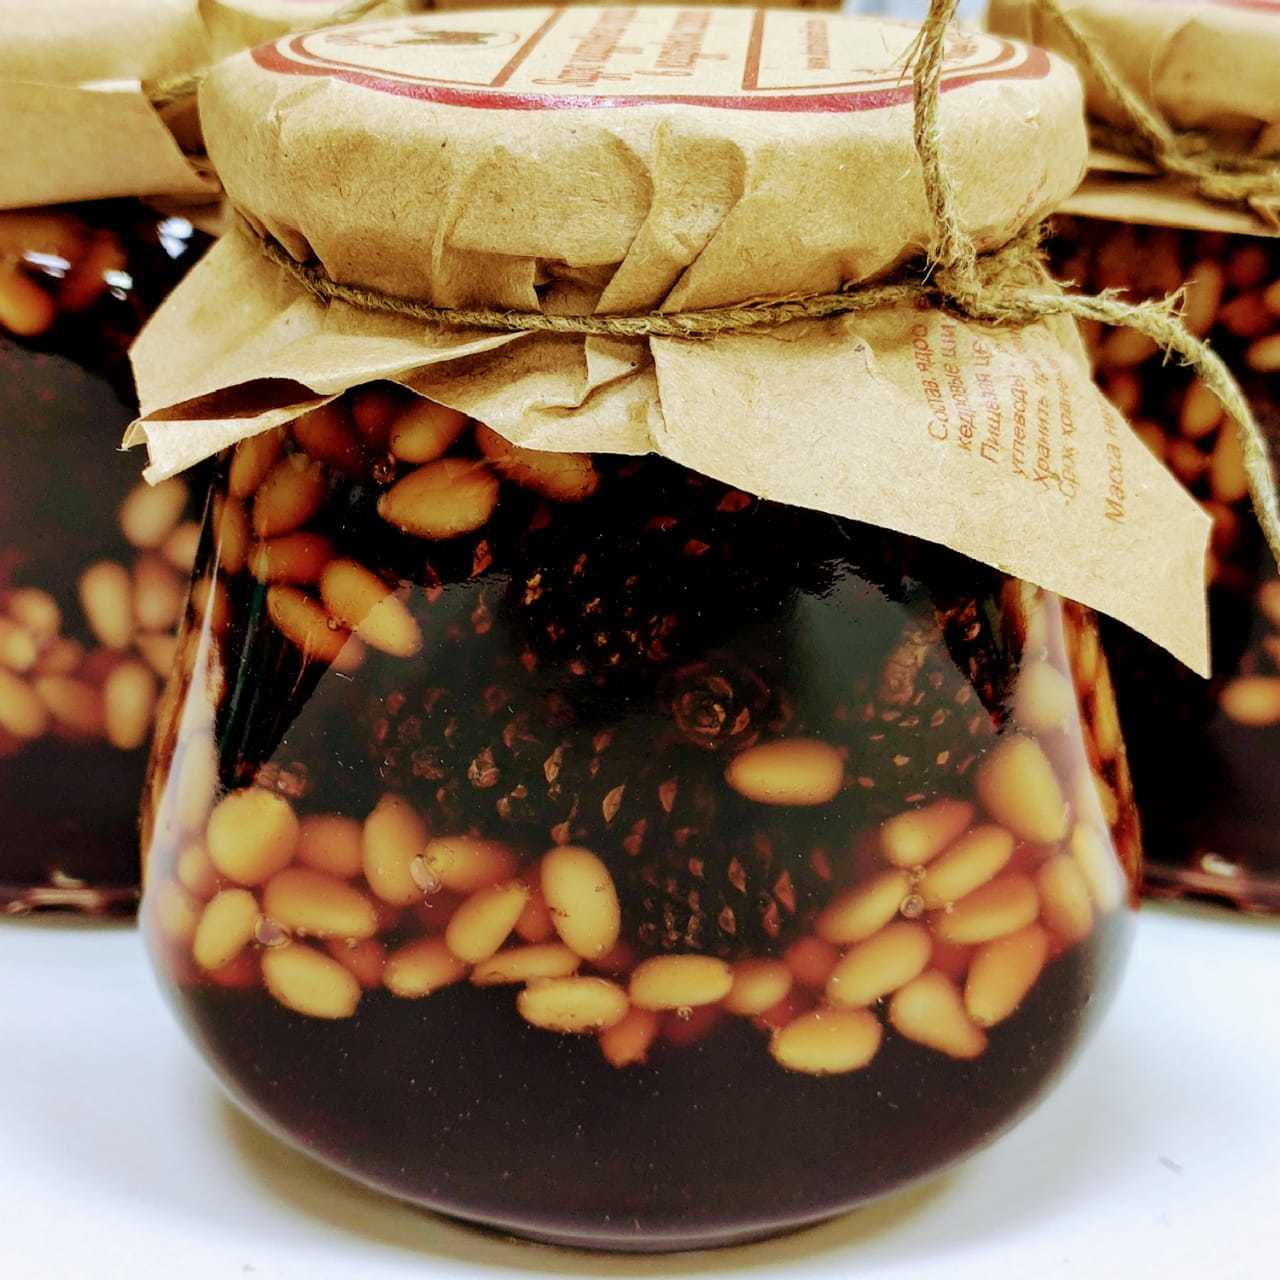 Кедровые шишки и орехи в кедровом сиропе, 330г I 2coffeemaniacs.ru